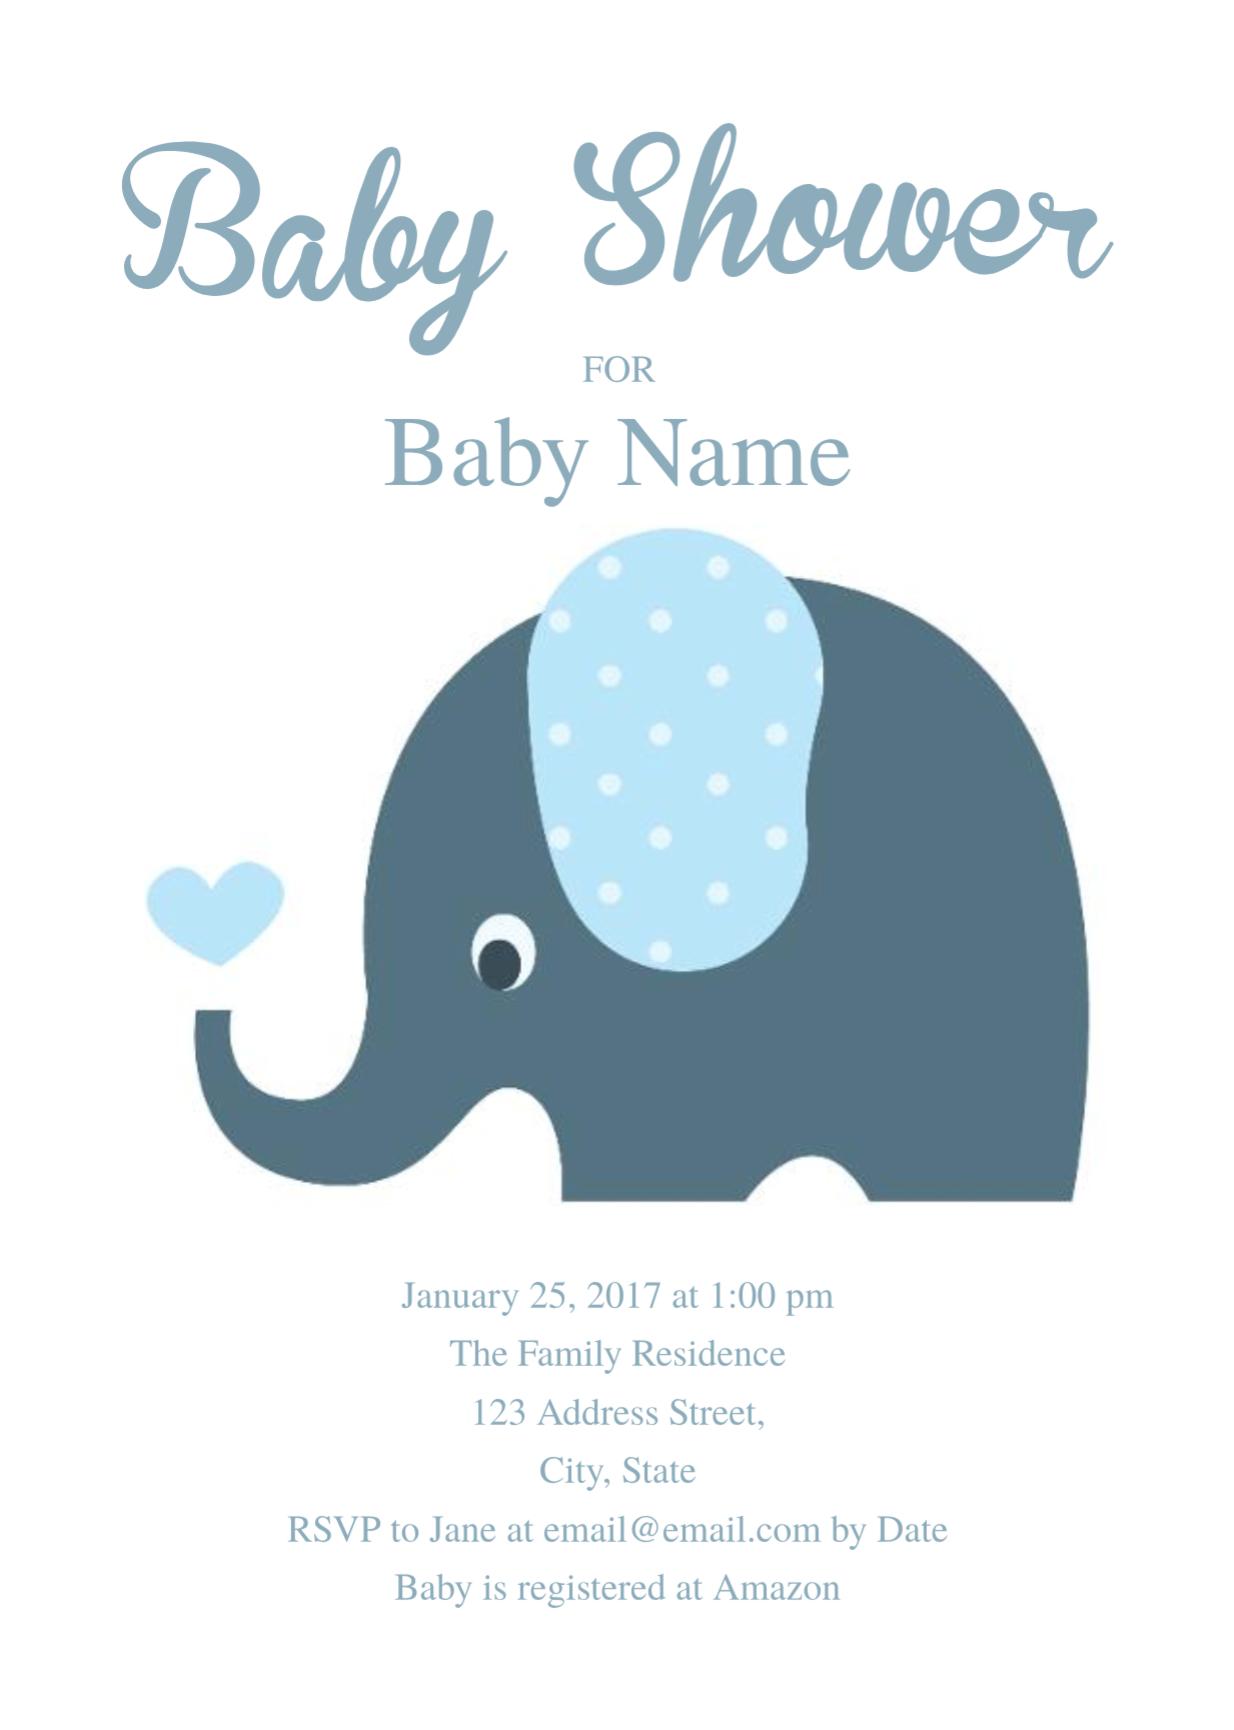 005 Template Ideas Free Baby Shower Invitation Fascinating With Regard To Free Baby Shower Invitation Templates Microsoft Word